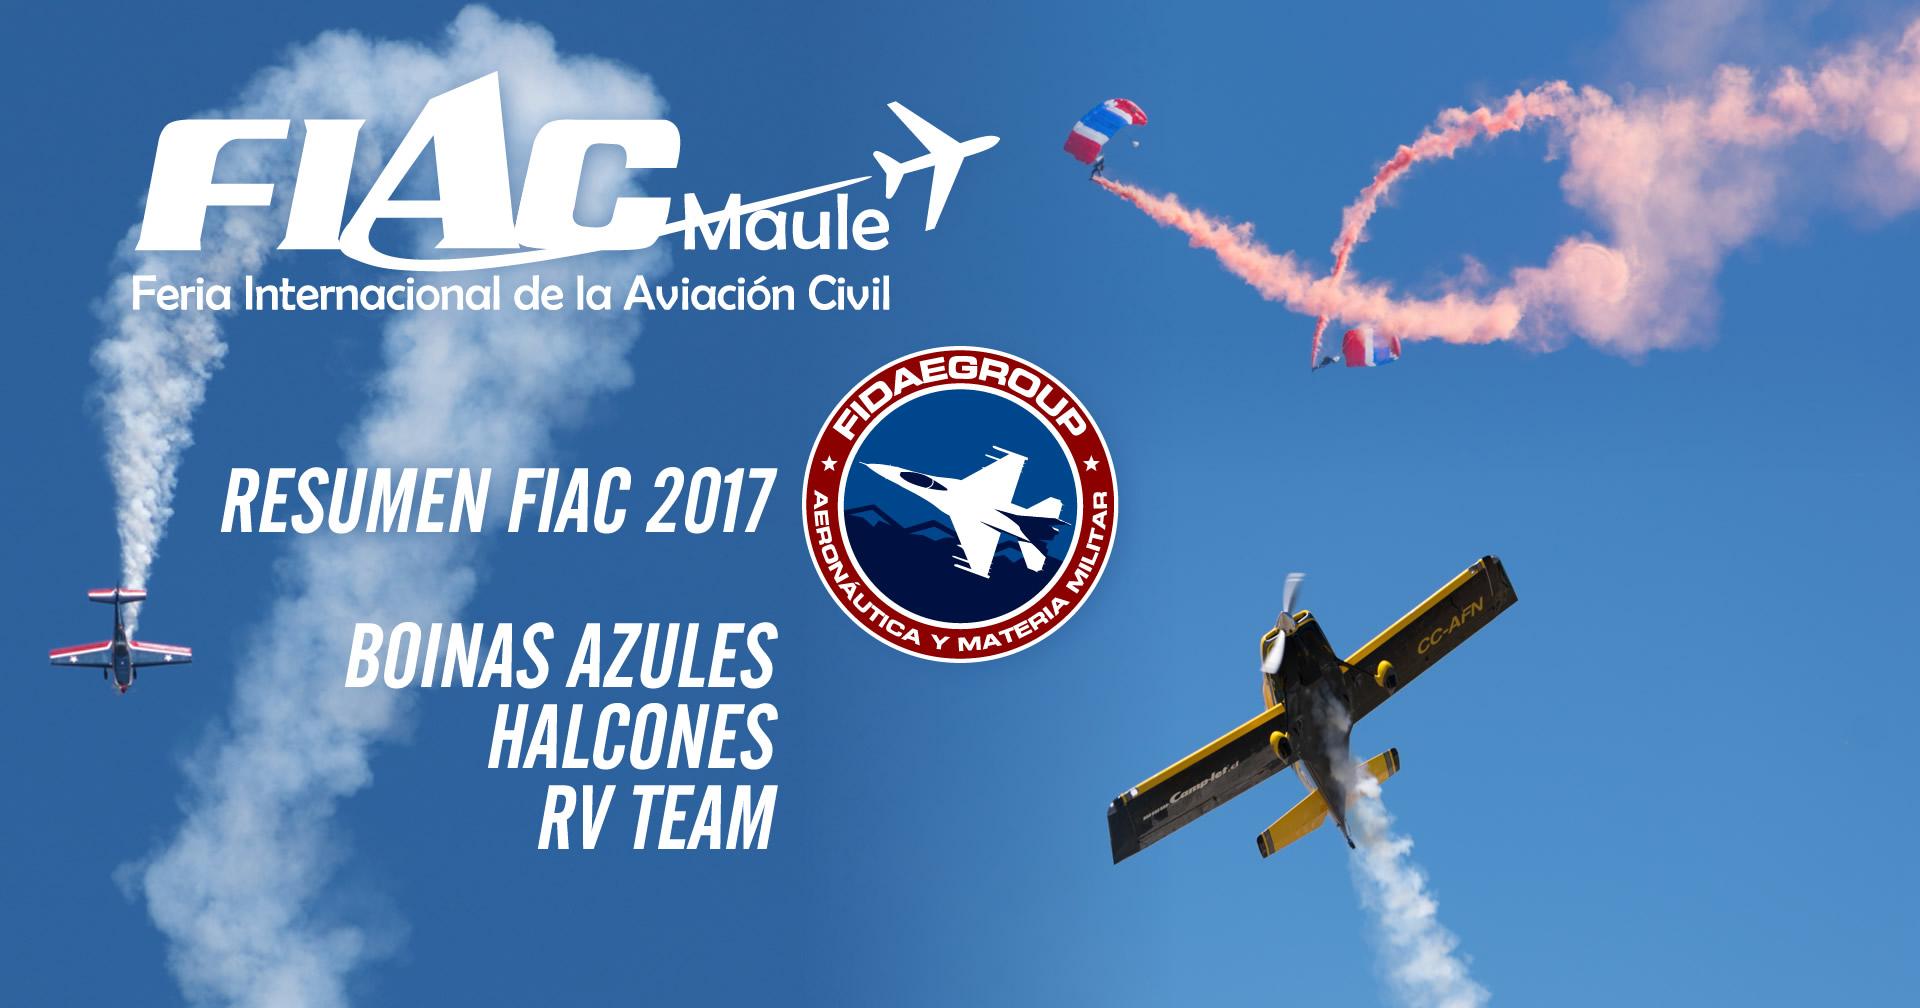 Feria Internacional de la Aviación Comercial FIAC 2017, Aeródromo Panguilemo